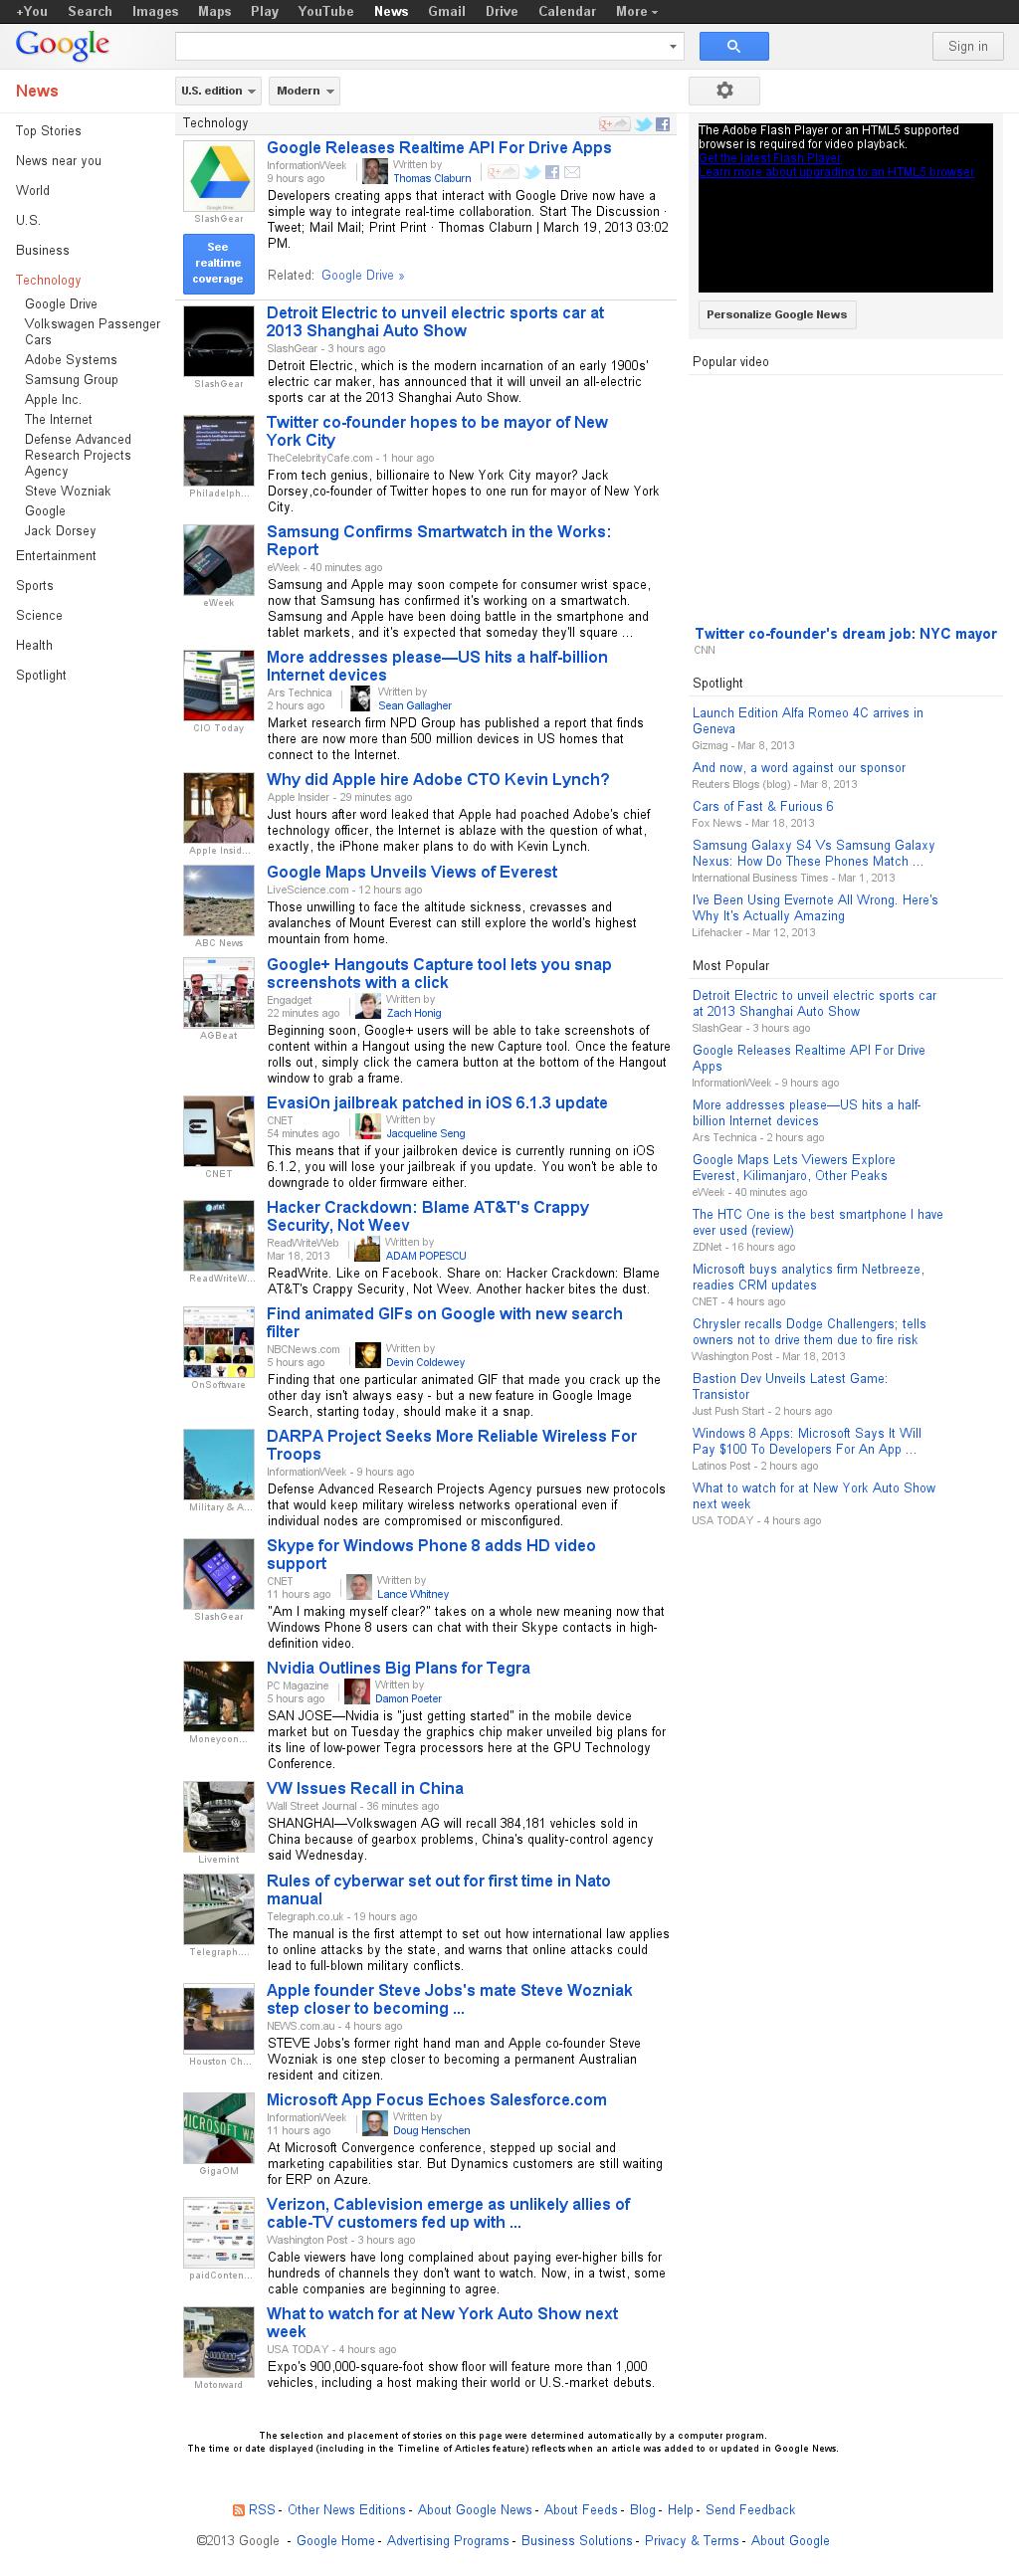 Google News: Technology at Wednesday March 20, 2013, 4:11 a.m. UTC